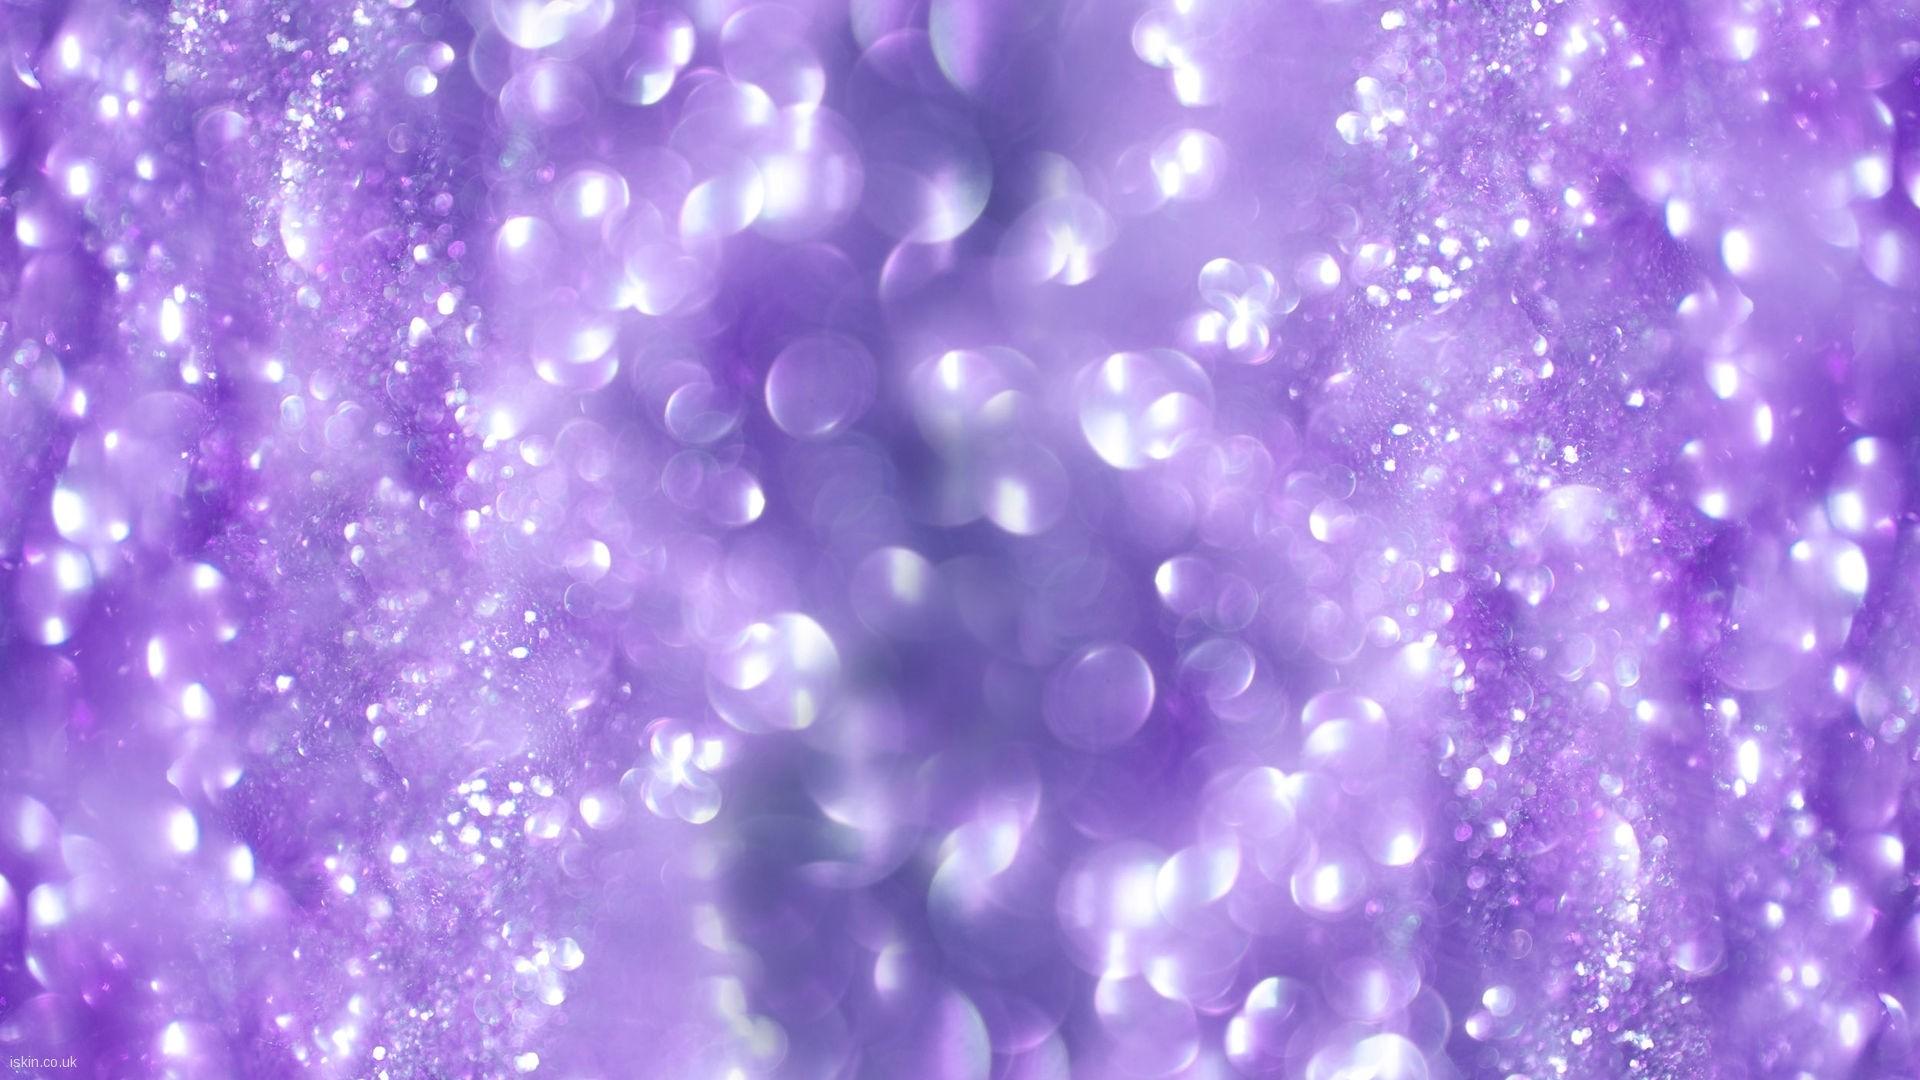 Light Purple Image